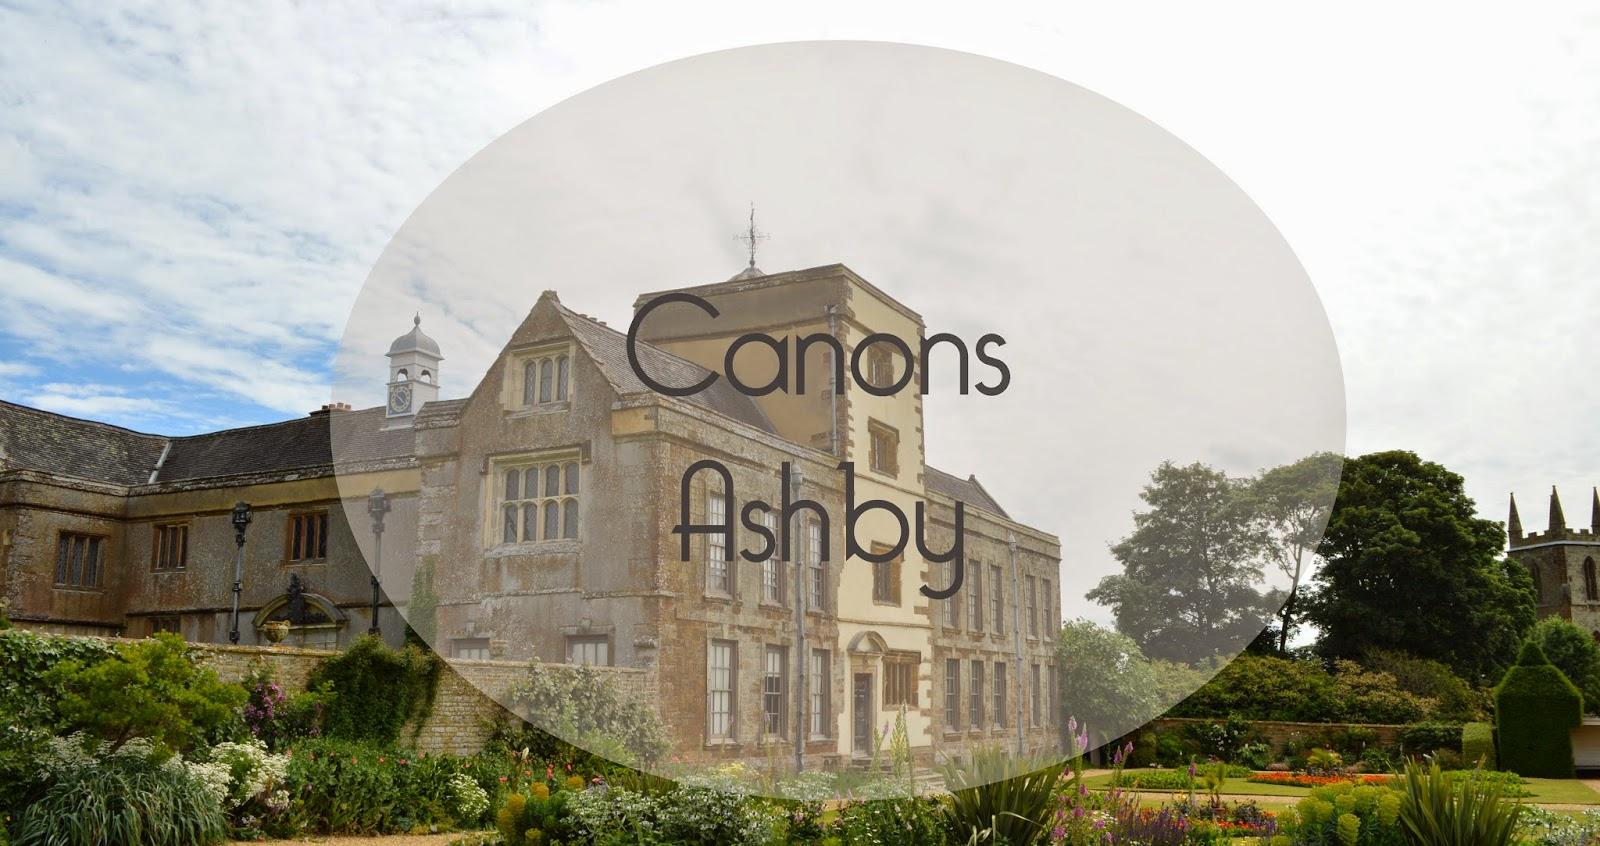 Canons Ashby, historical building, House and gardens, Drydan family, garden, Tudor brick, Jacobean Plaster, travel lodge, shepherd boy statue, photo, photograph, visit, day trip